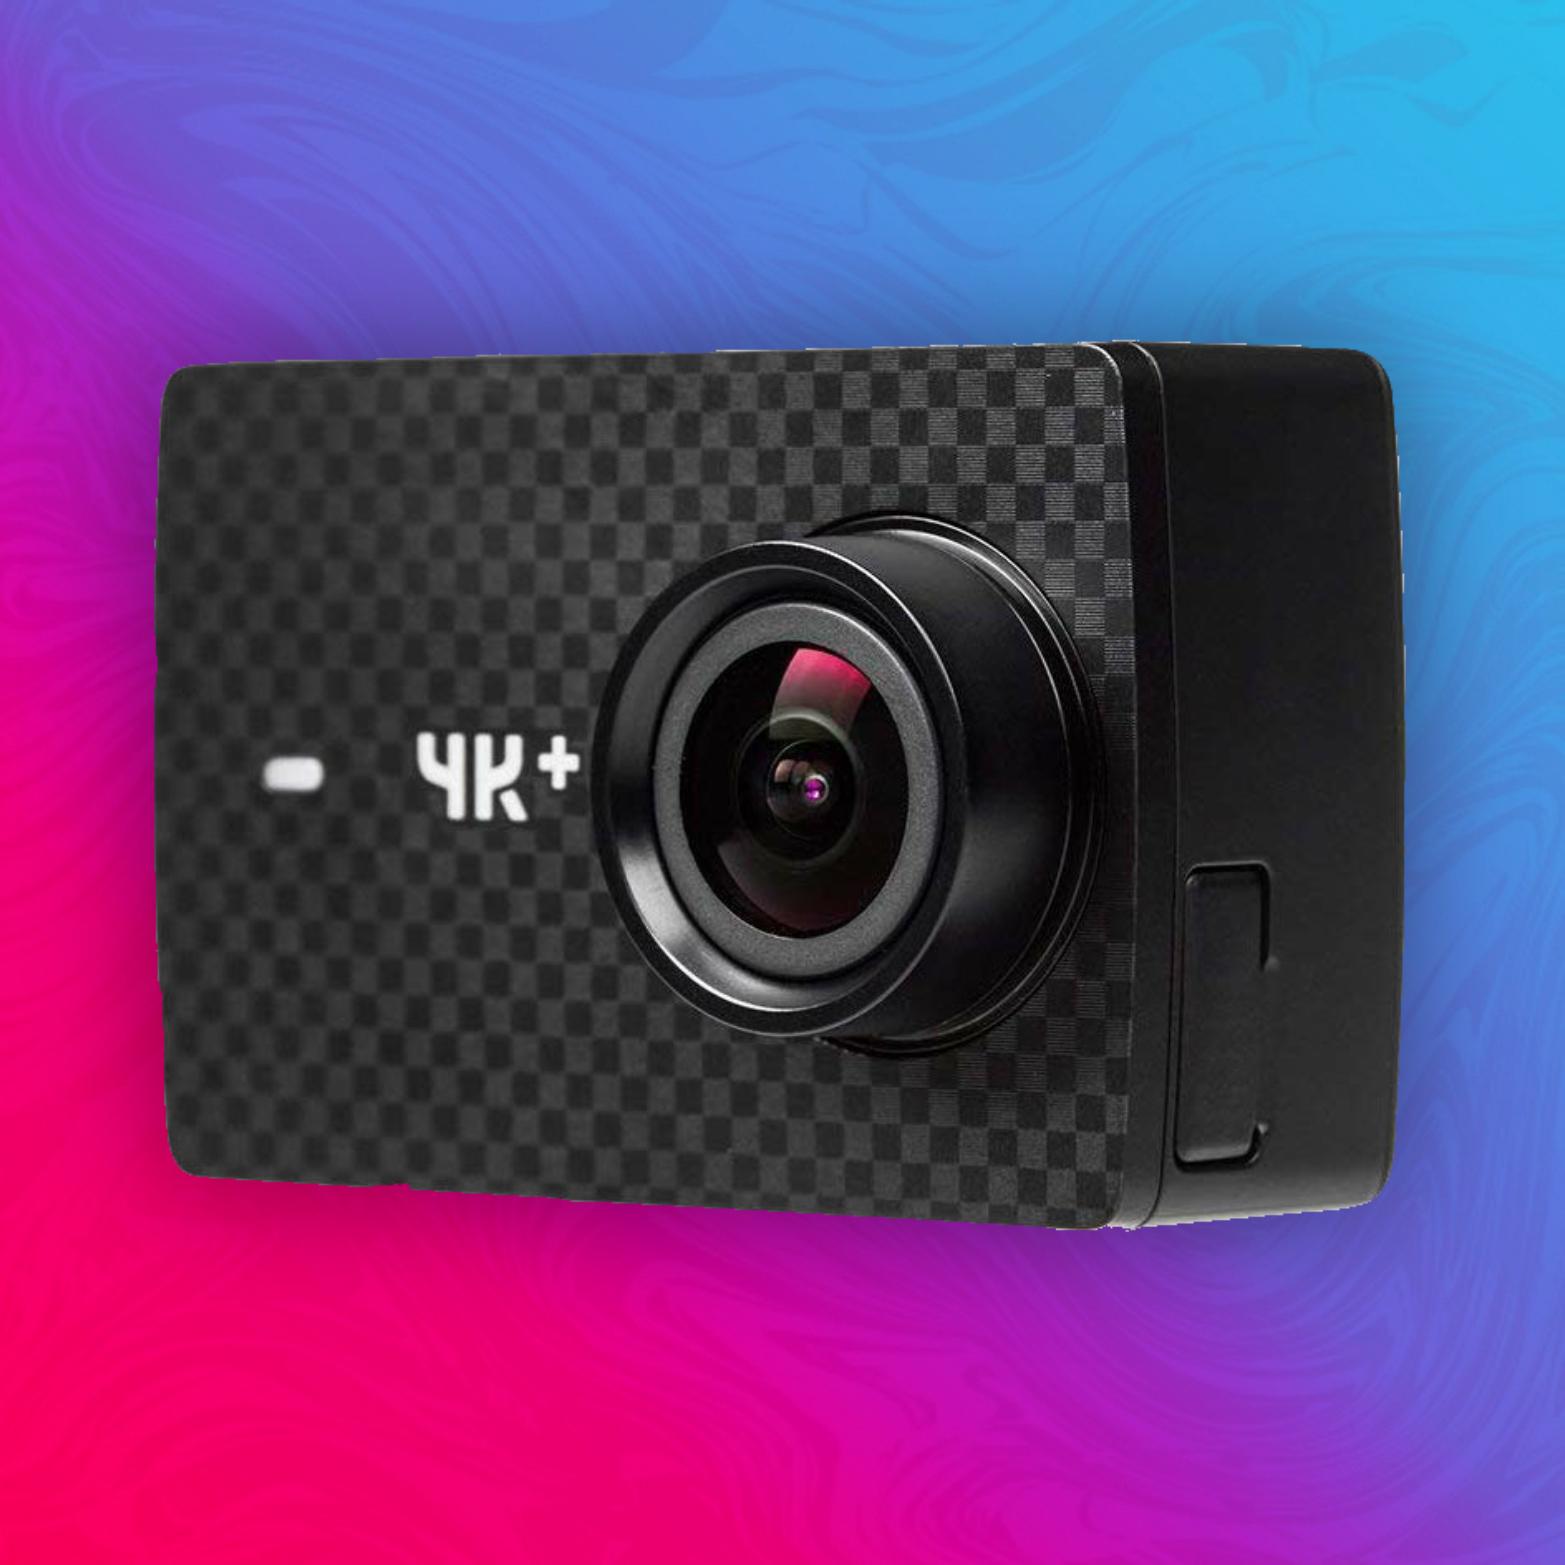 YI 4K+ Action Cam (4K/60fps, 12MP Sensor) [Amazon Prime]